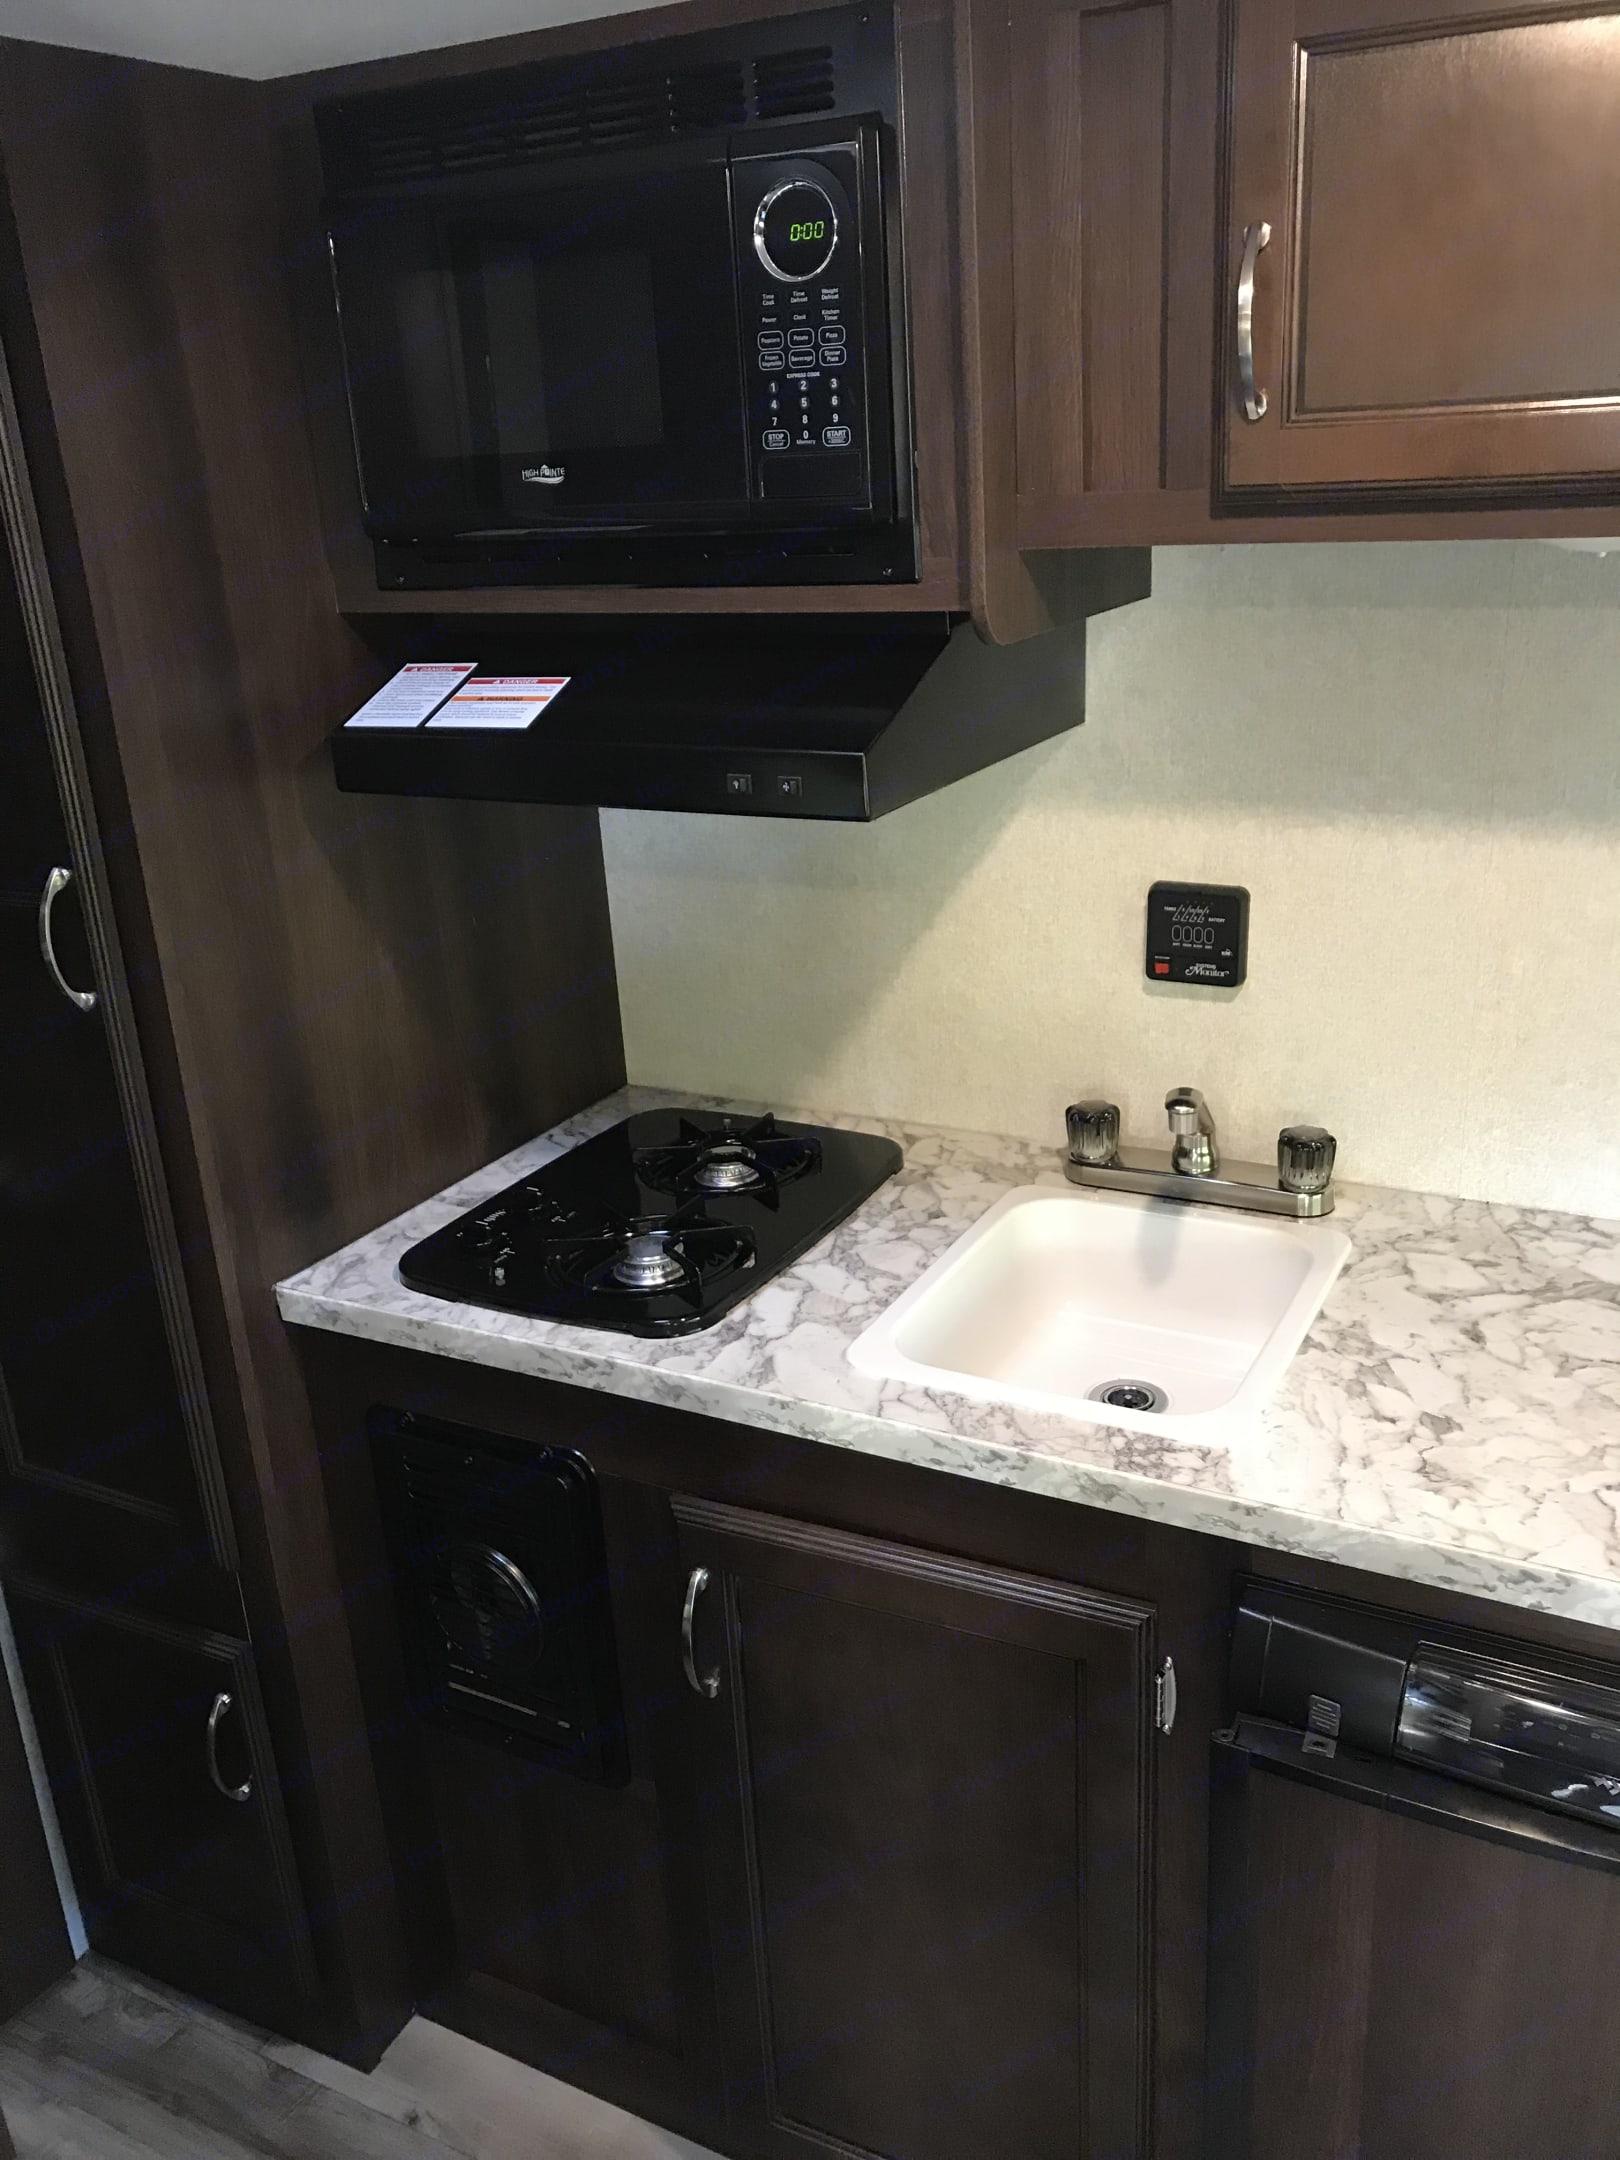 Kitchen counter / sink / 2 burner stove / range hood with exhaust . Jayco Jay Flight 2018